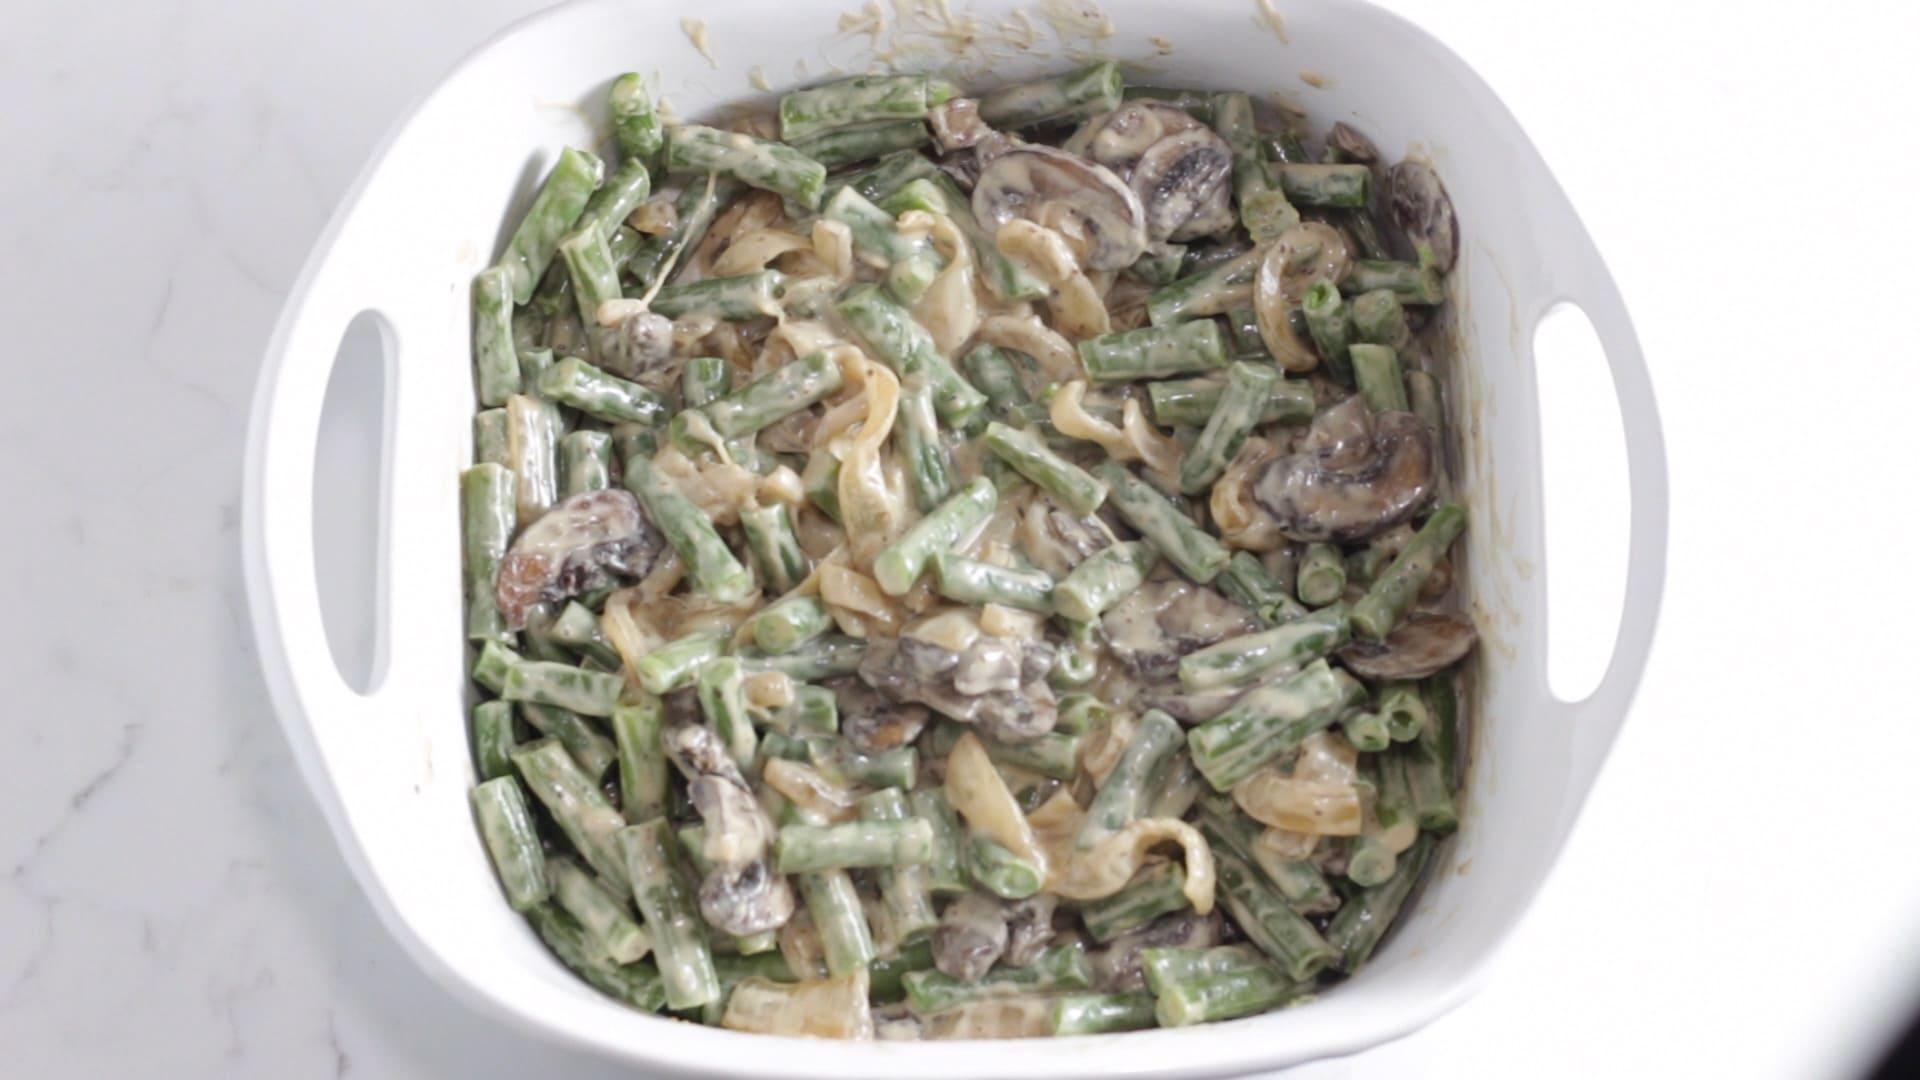 casserole dish with keto green bean casserole